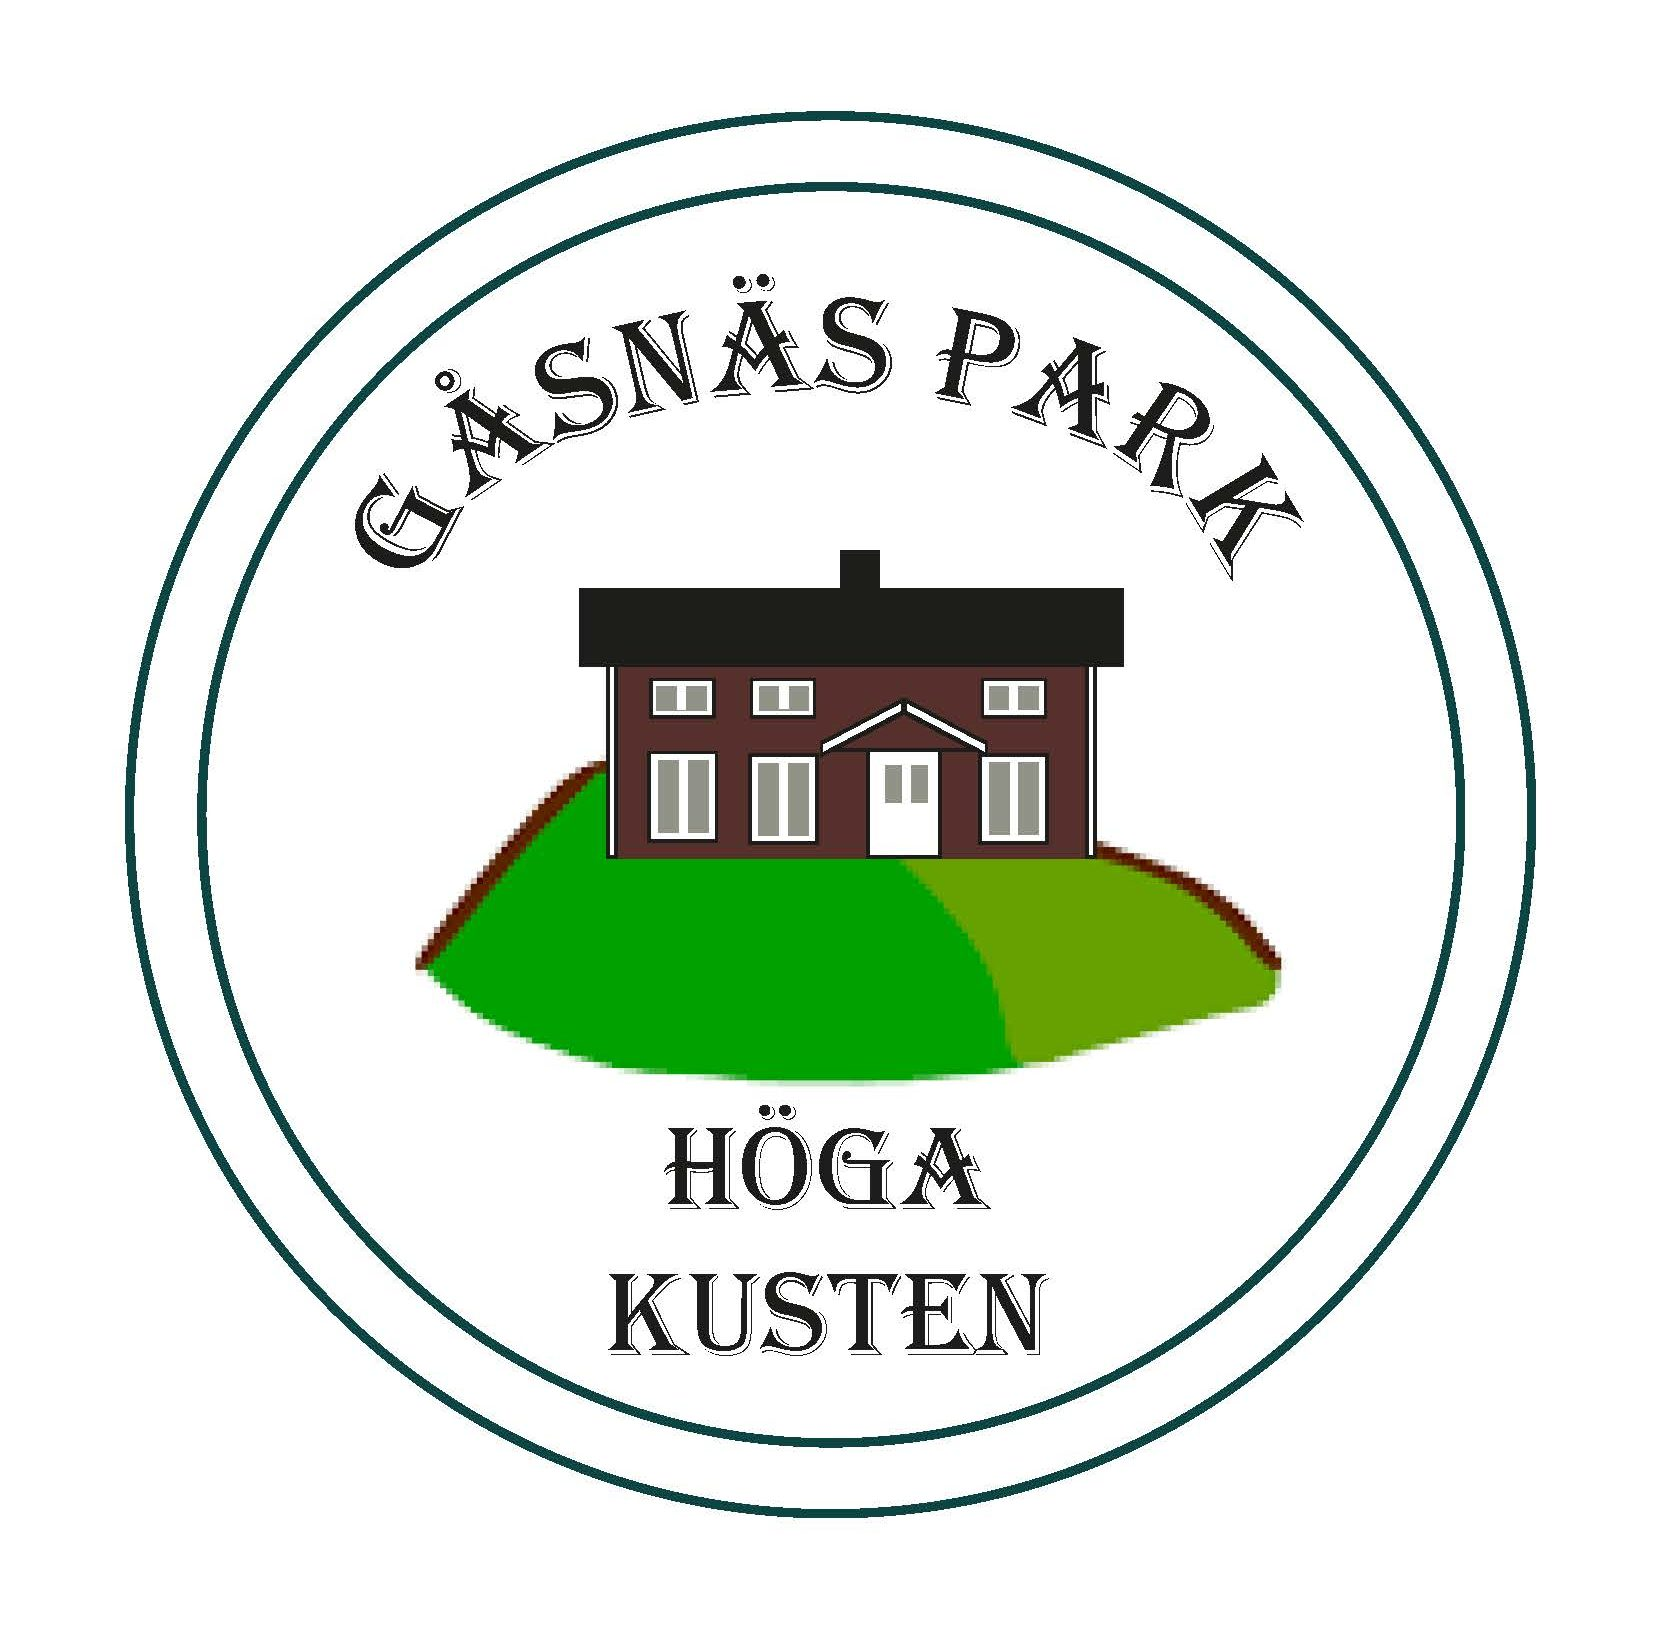 GåsnäsPark